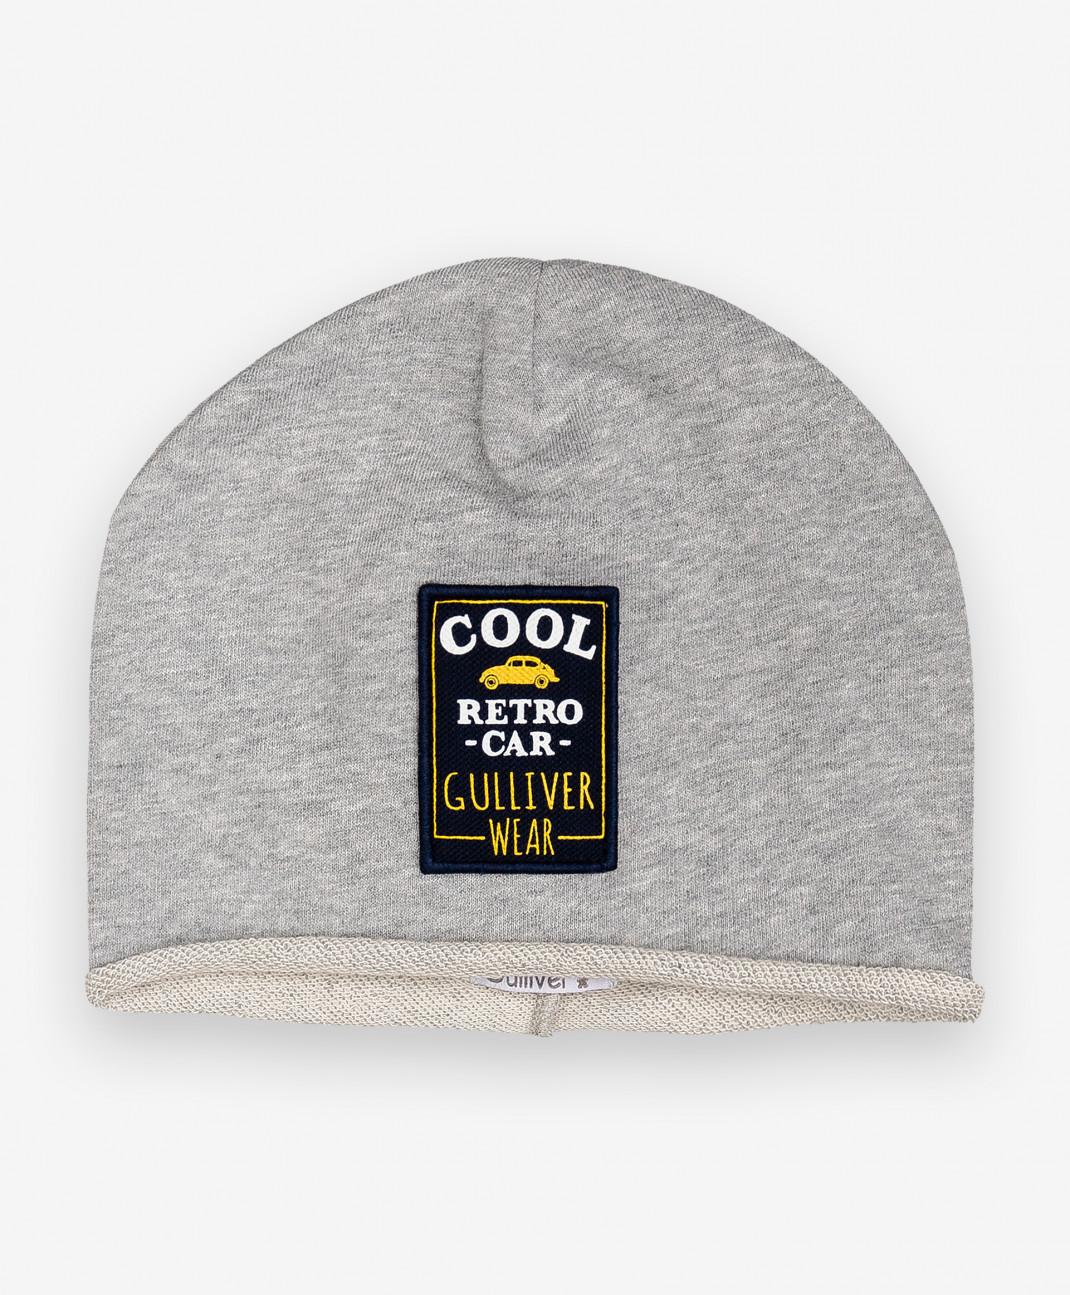 Gulliver Baby Трикотажная шапка с принтом Gulliver